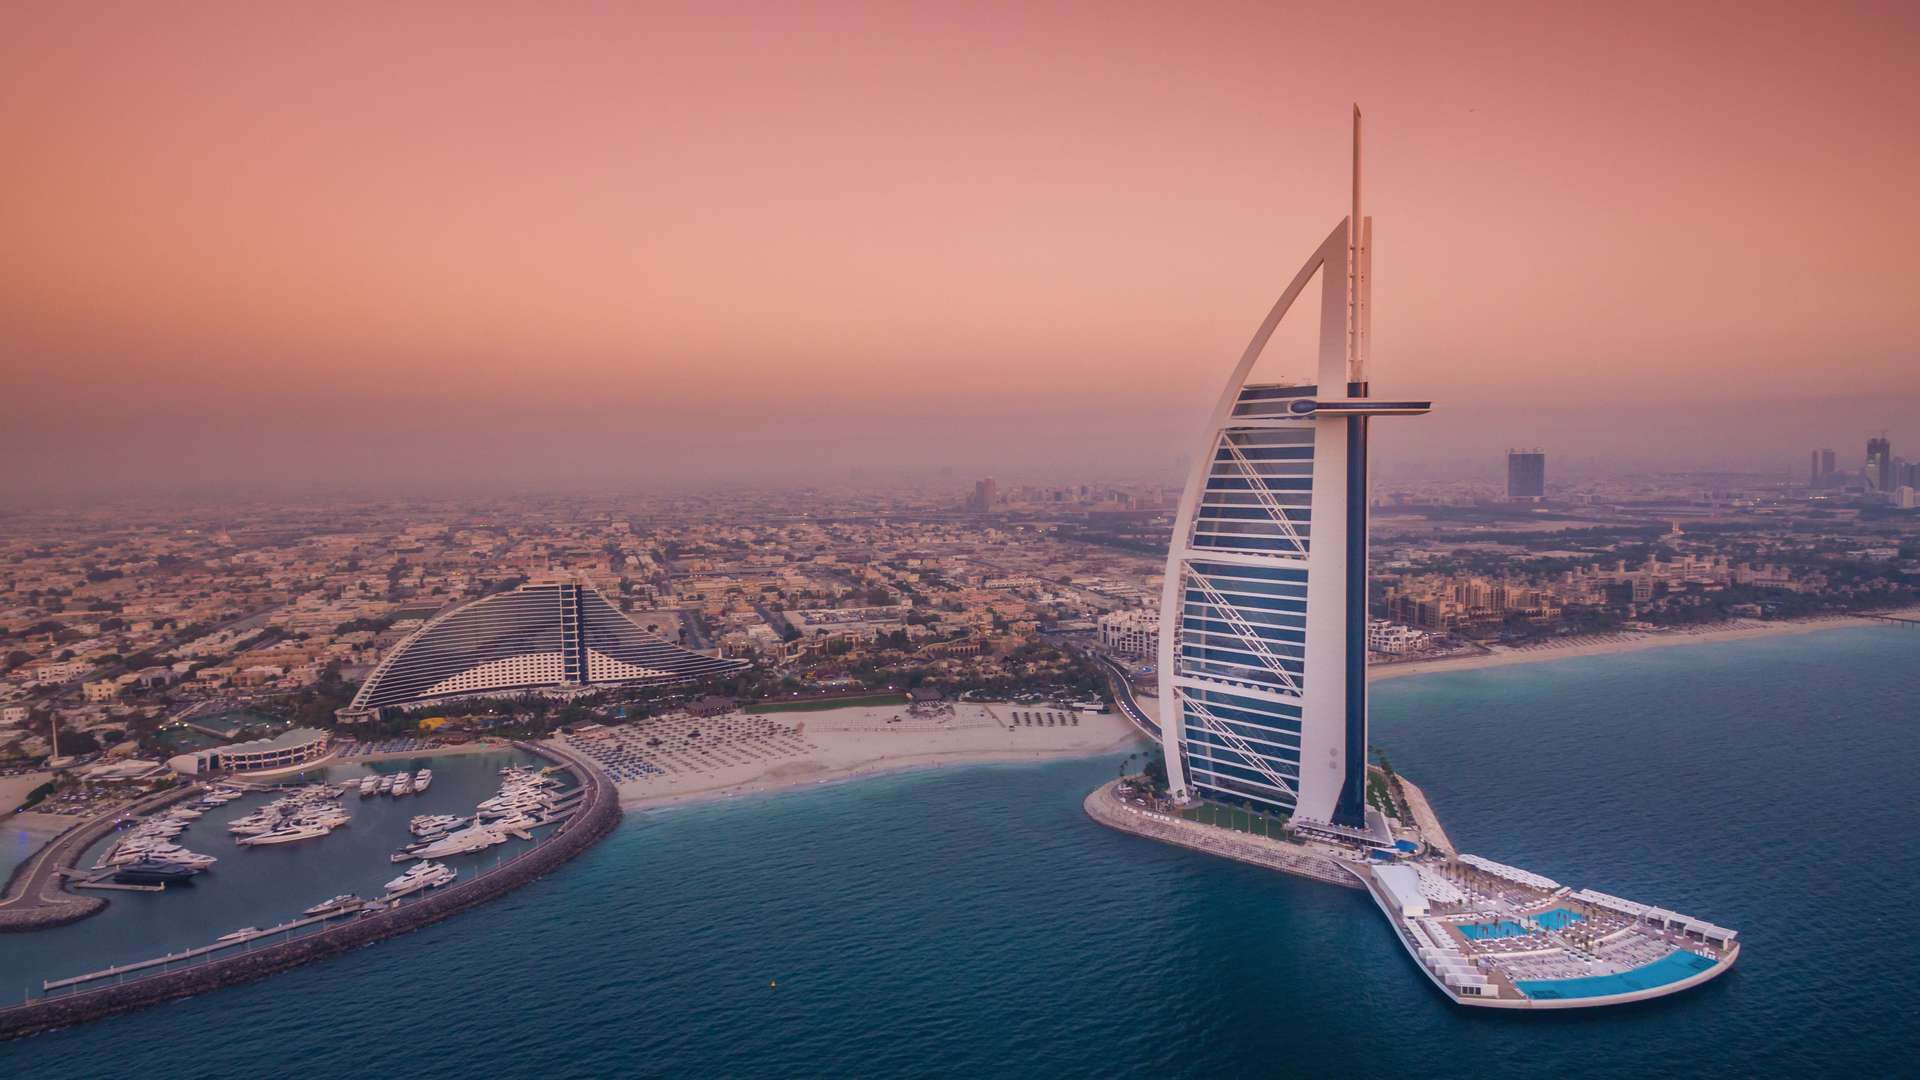 Burj Al Arab Jumeirah A Kuoni Hotel In Dubai